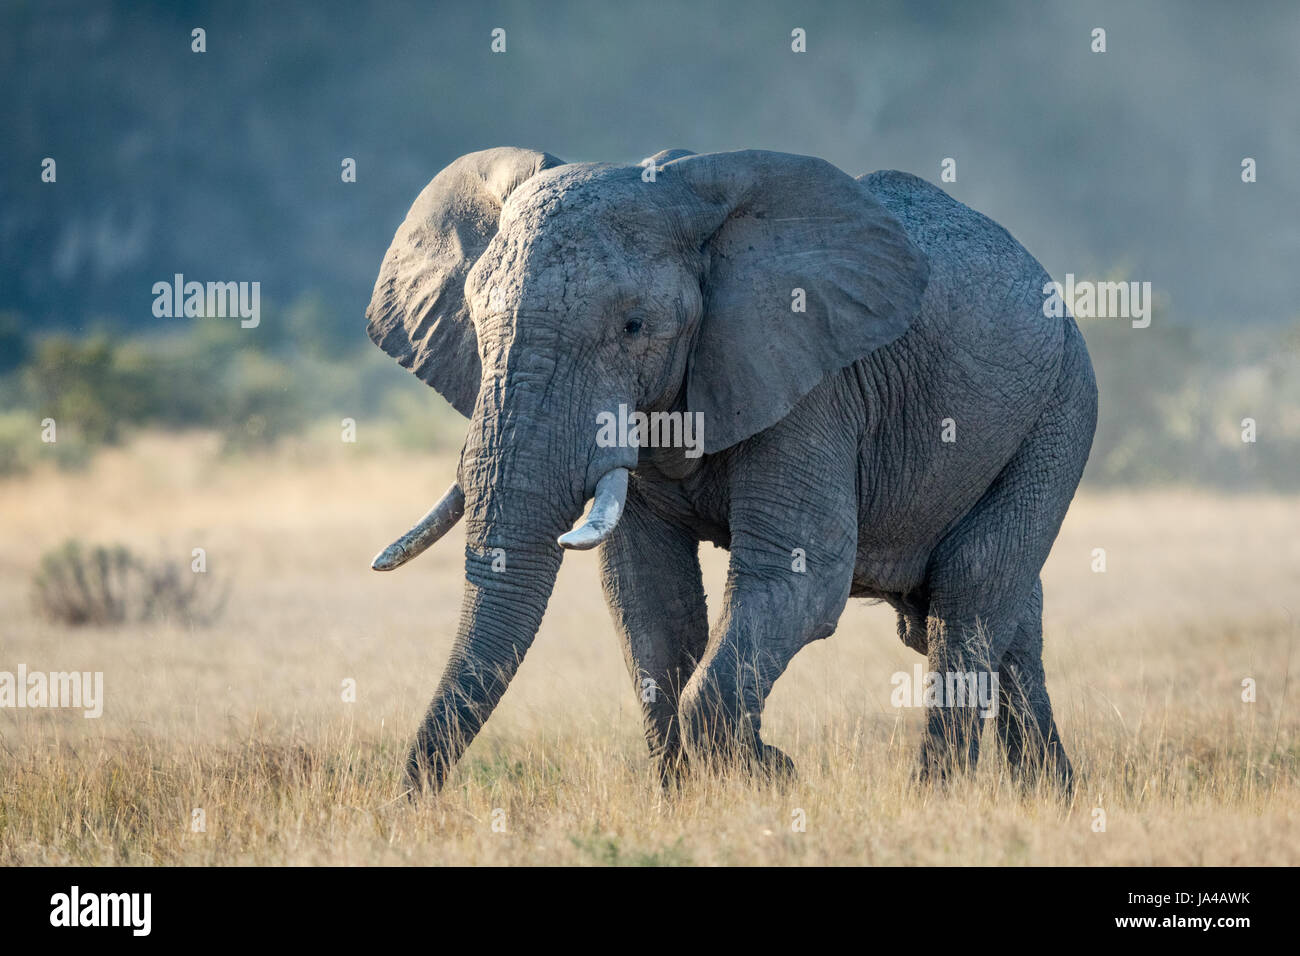 A bull Elephant in the Savuti area of the Chobe National Park in Botswana - Stock Image